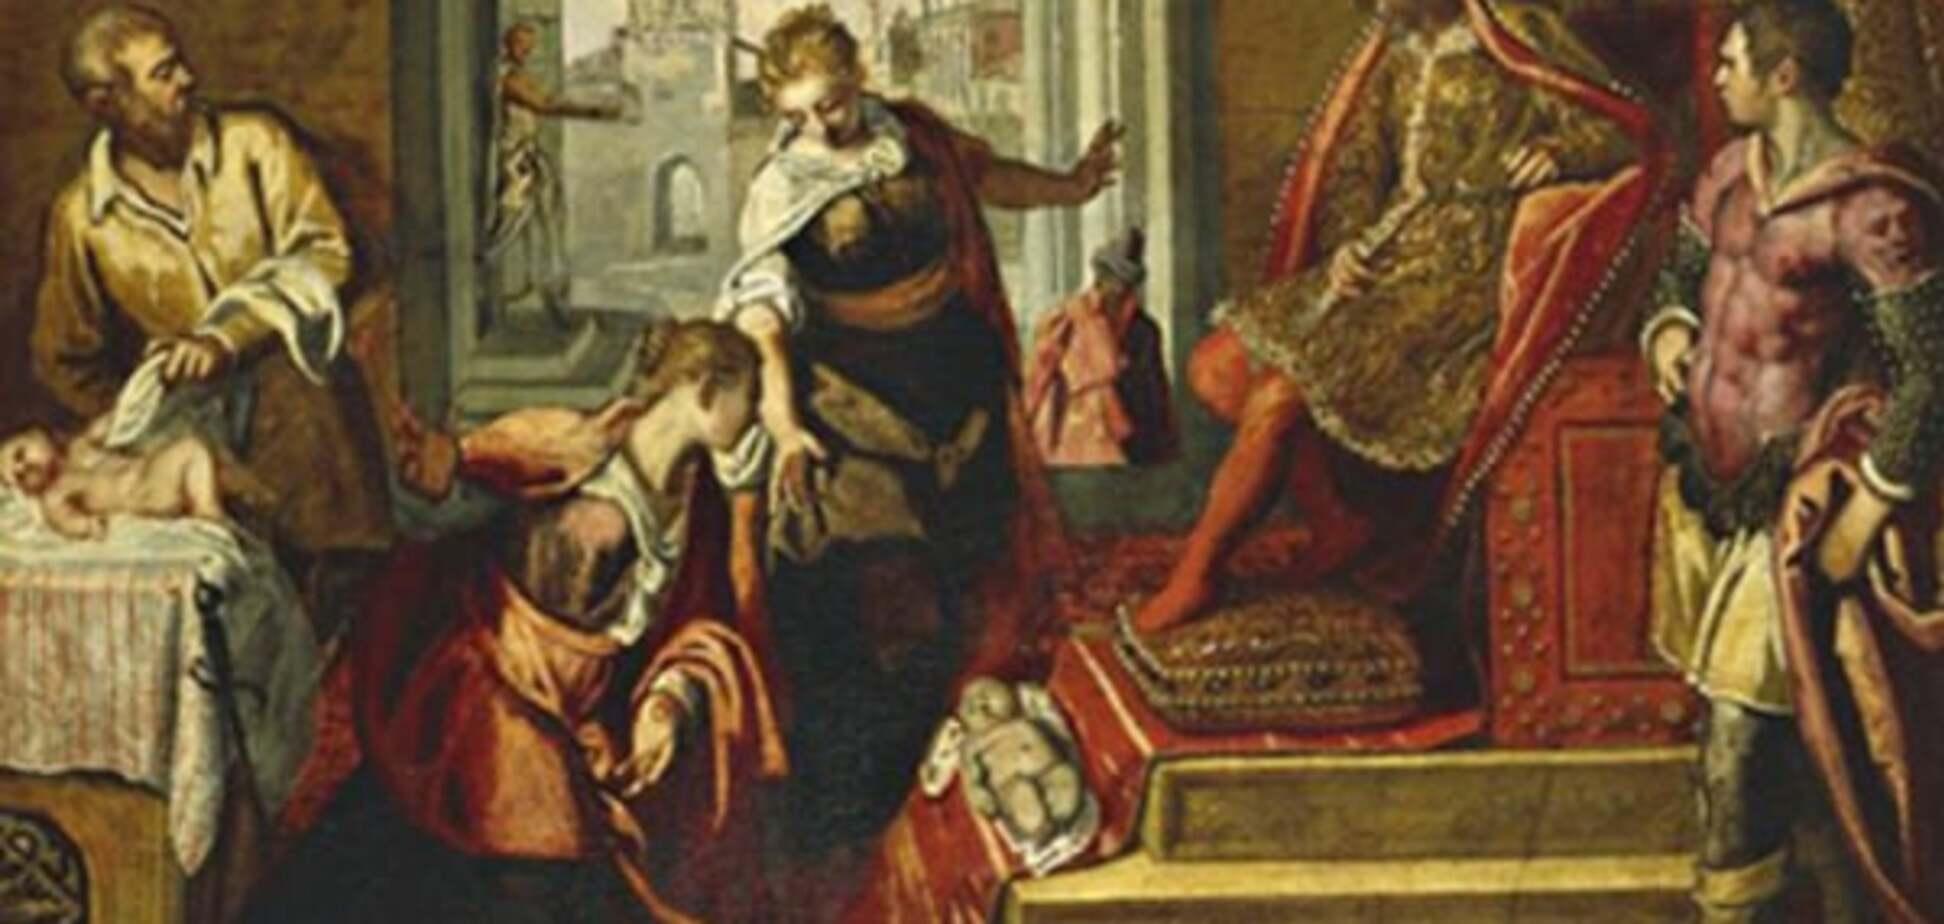 Из музея Вероны похитили полотна Рубенса, Беллини и Тинторетто на 15 млн евро